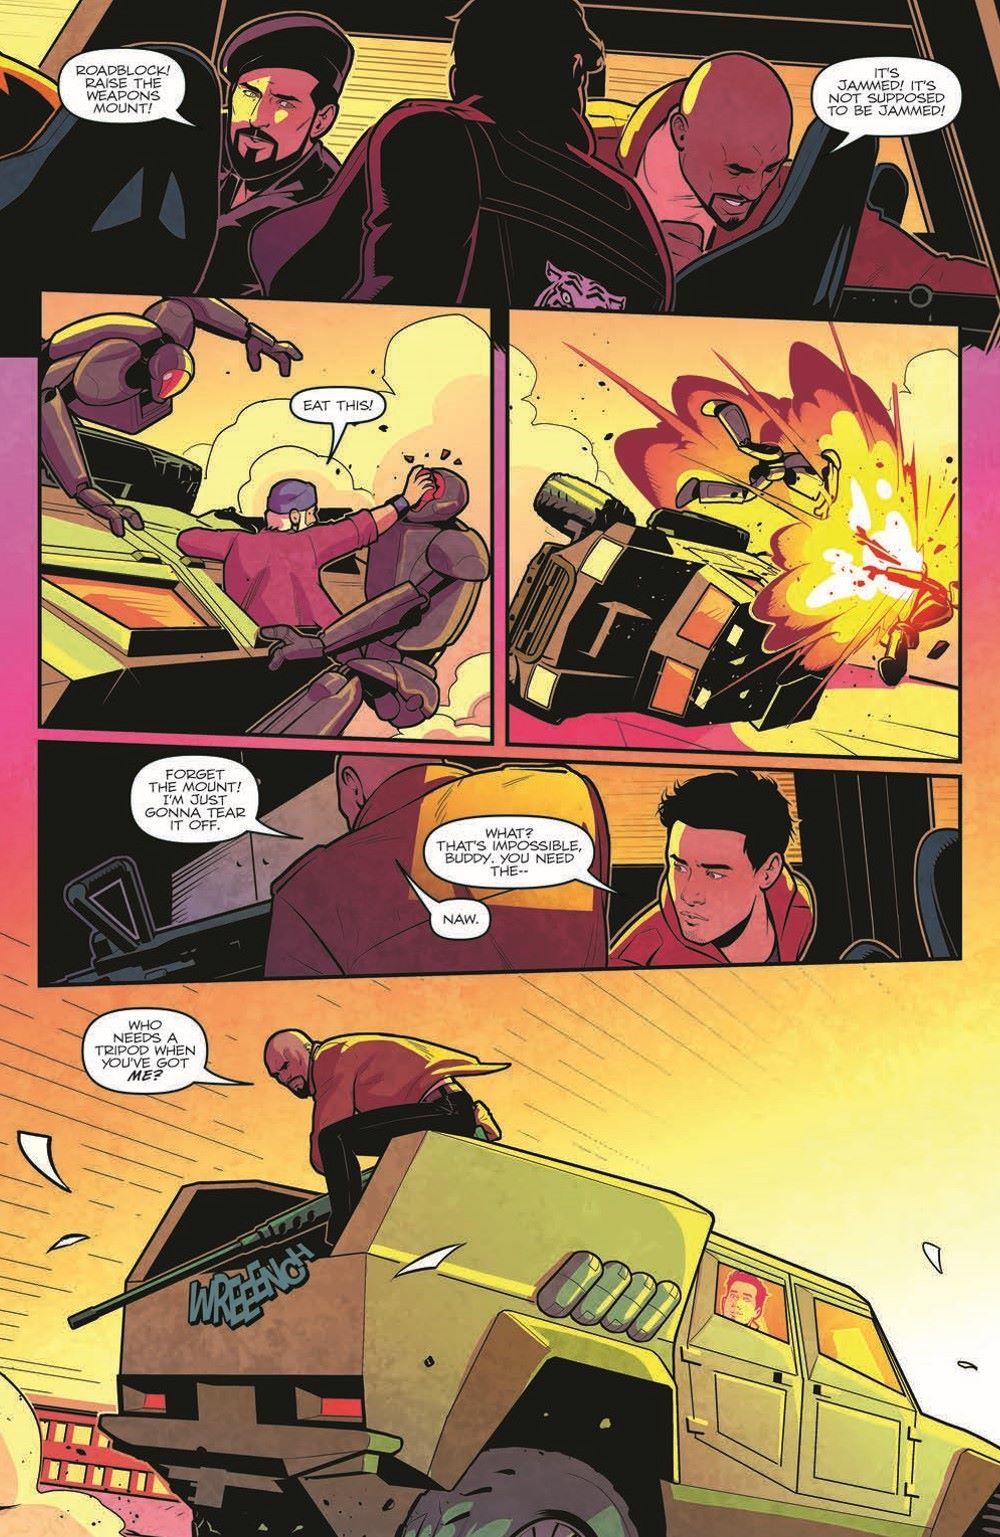 GIJoe_CastleFall-pr-7 ComicList Previews: G.I. JOE CASTLE FALL #1